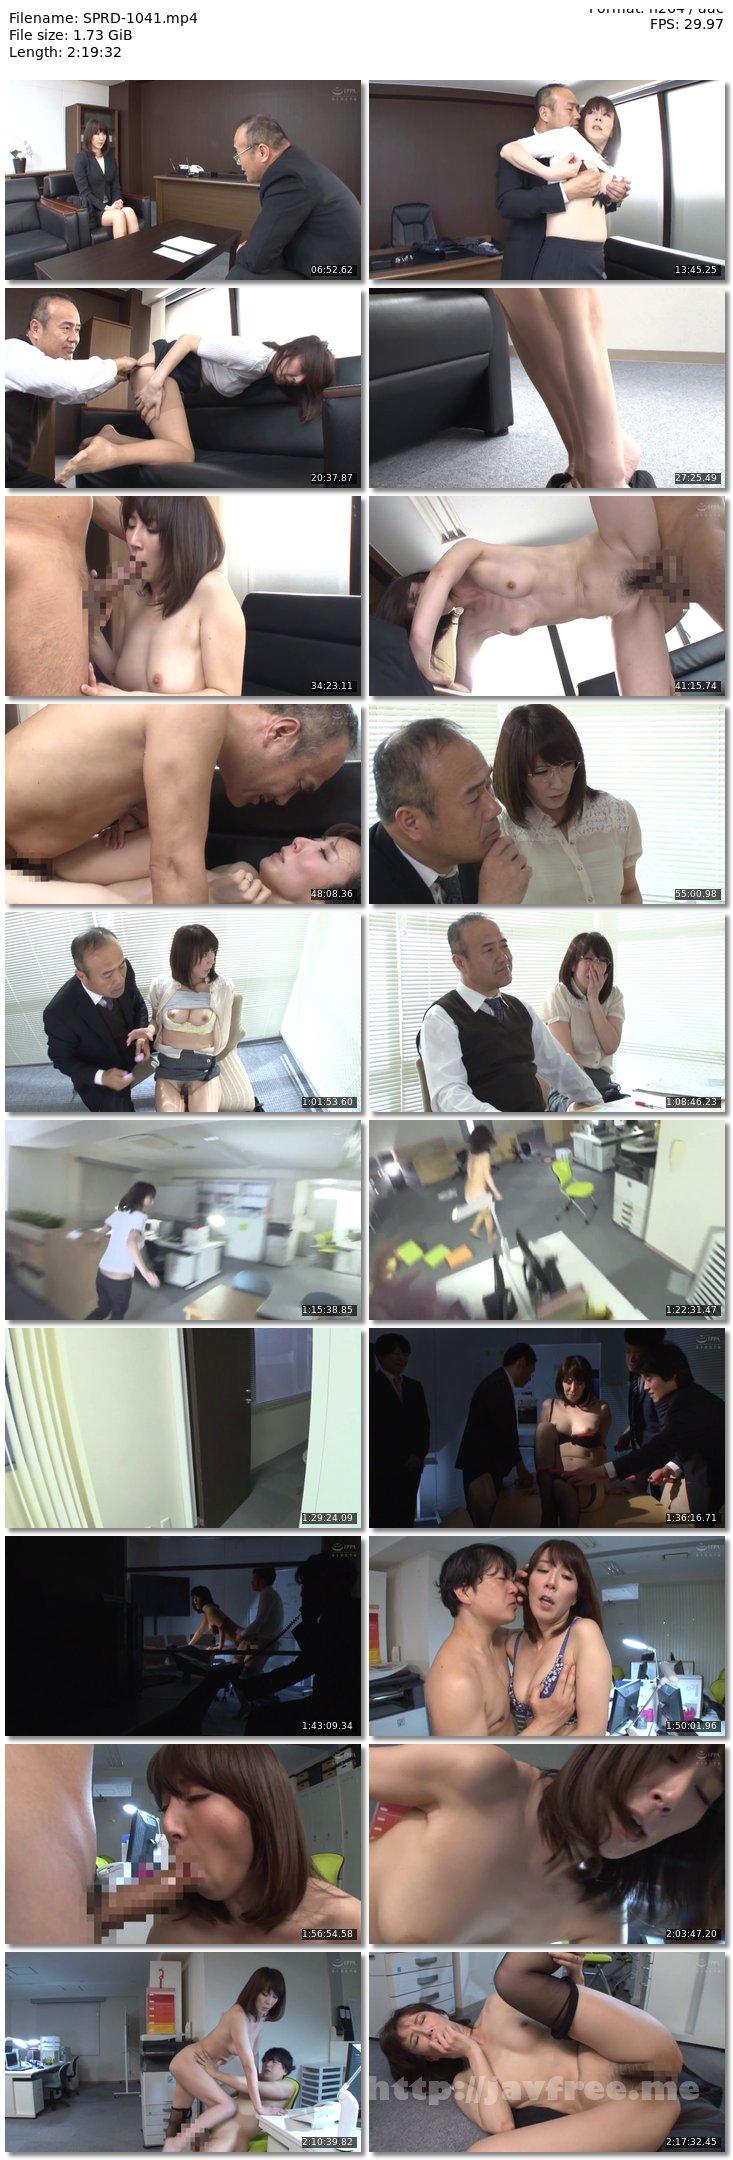 [SPRD-1041] 44歳再就職。ふたたび 澤村レイコ - image SPRD-1041 on https://javfree.me